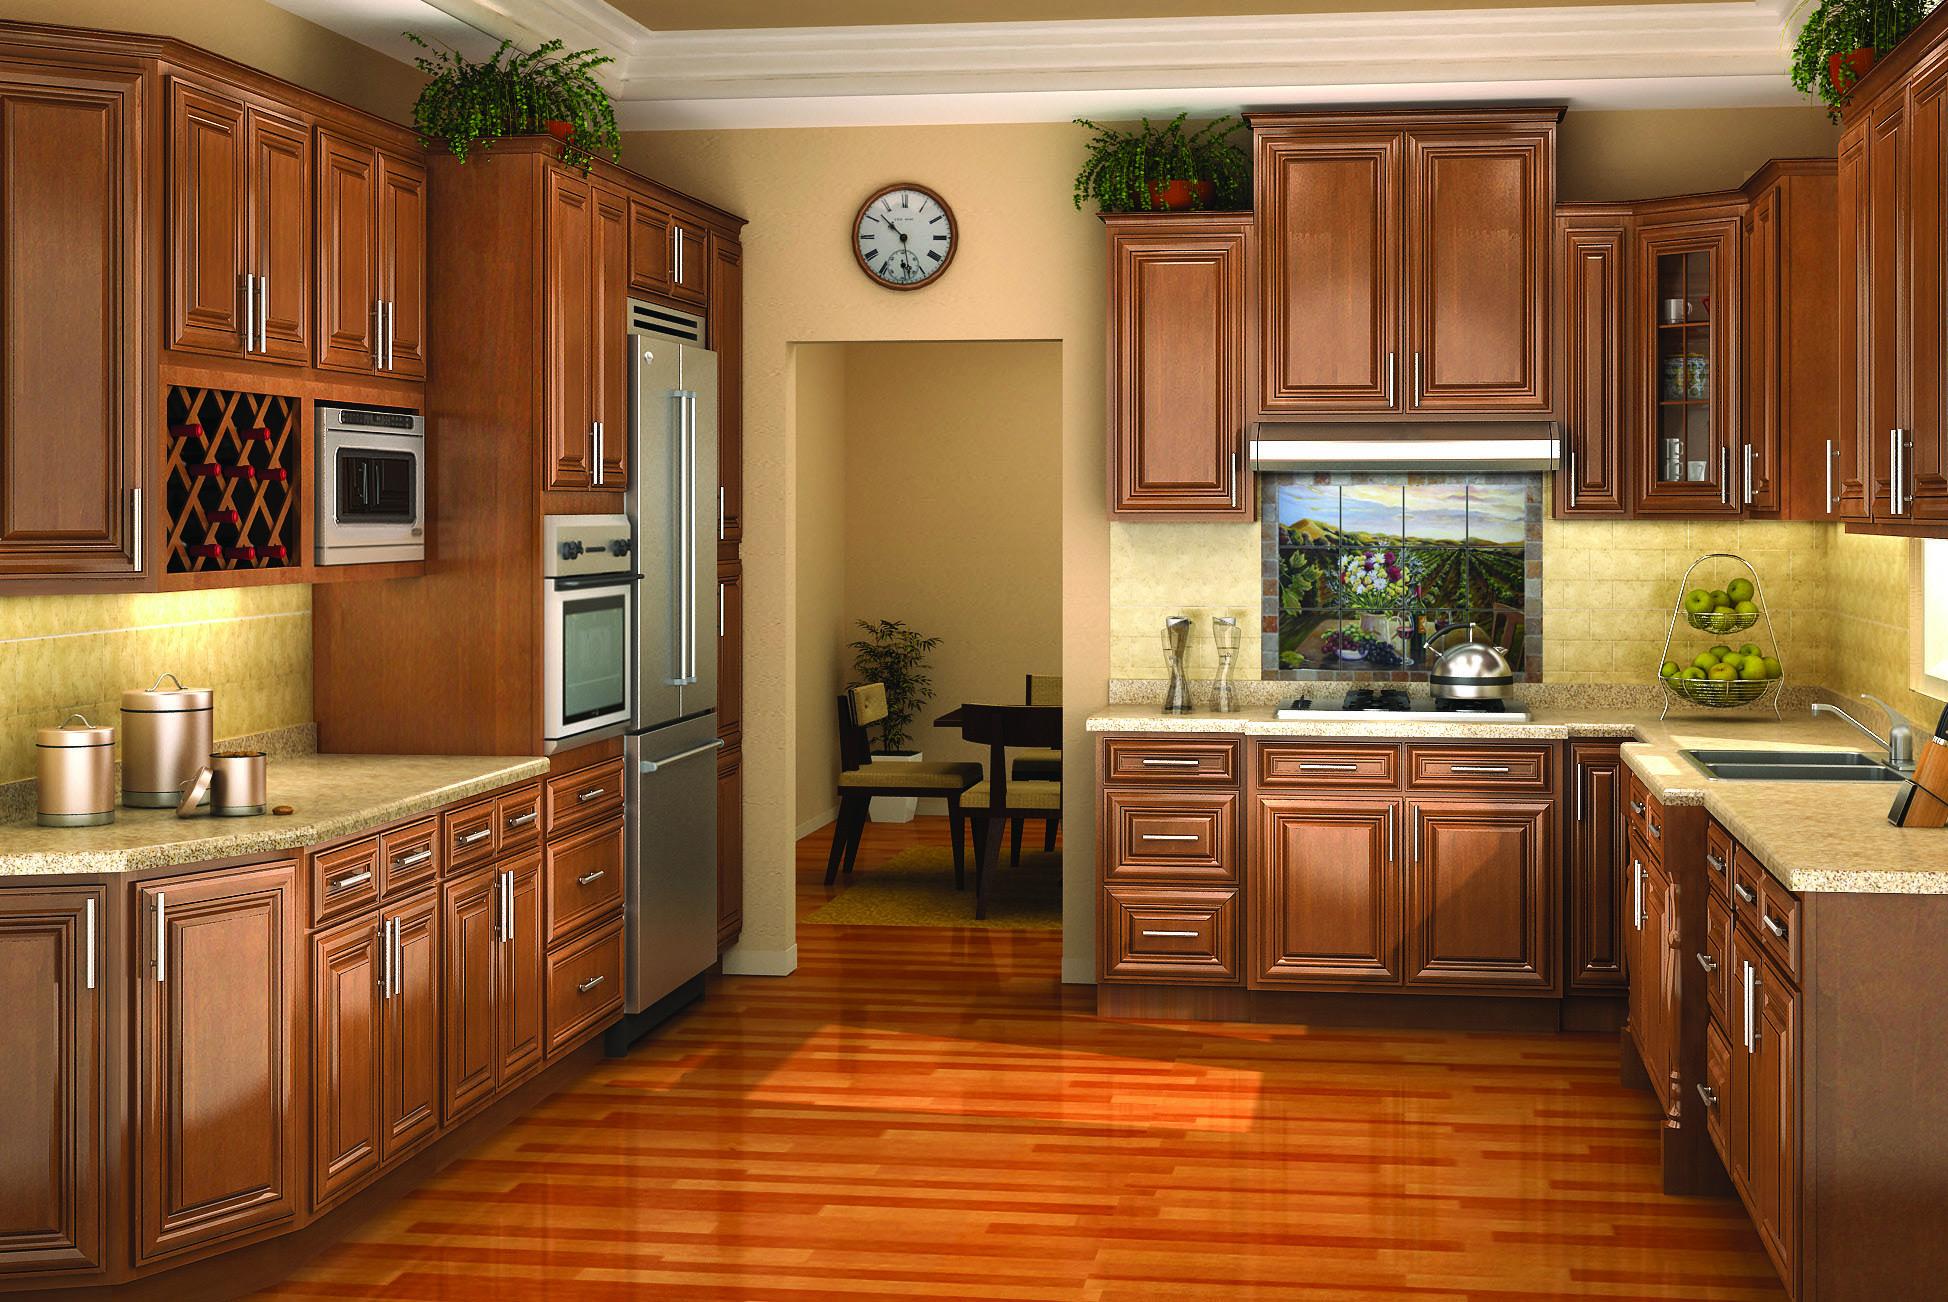 Kitchen Cabinets And Bath Design Winter Park Florida